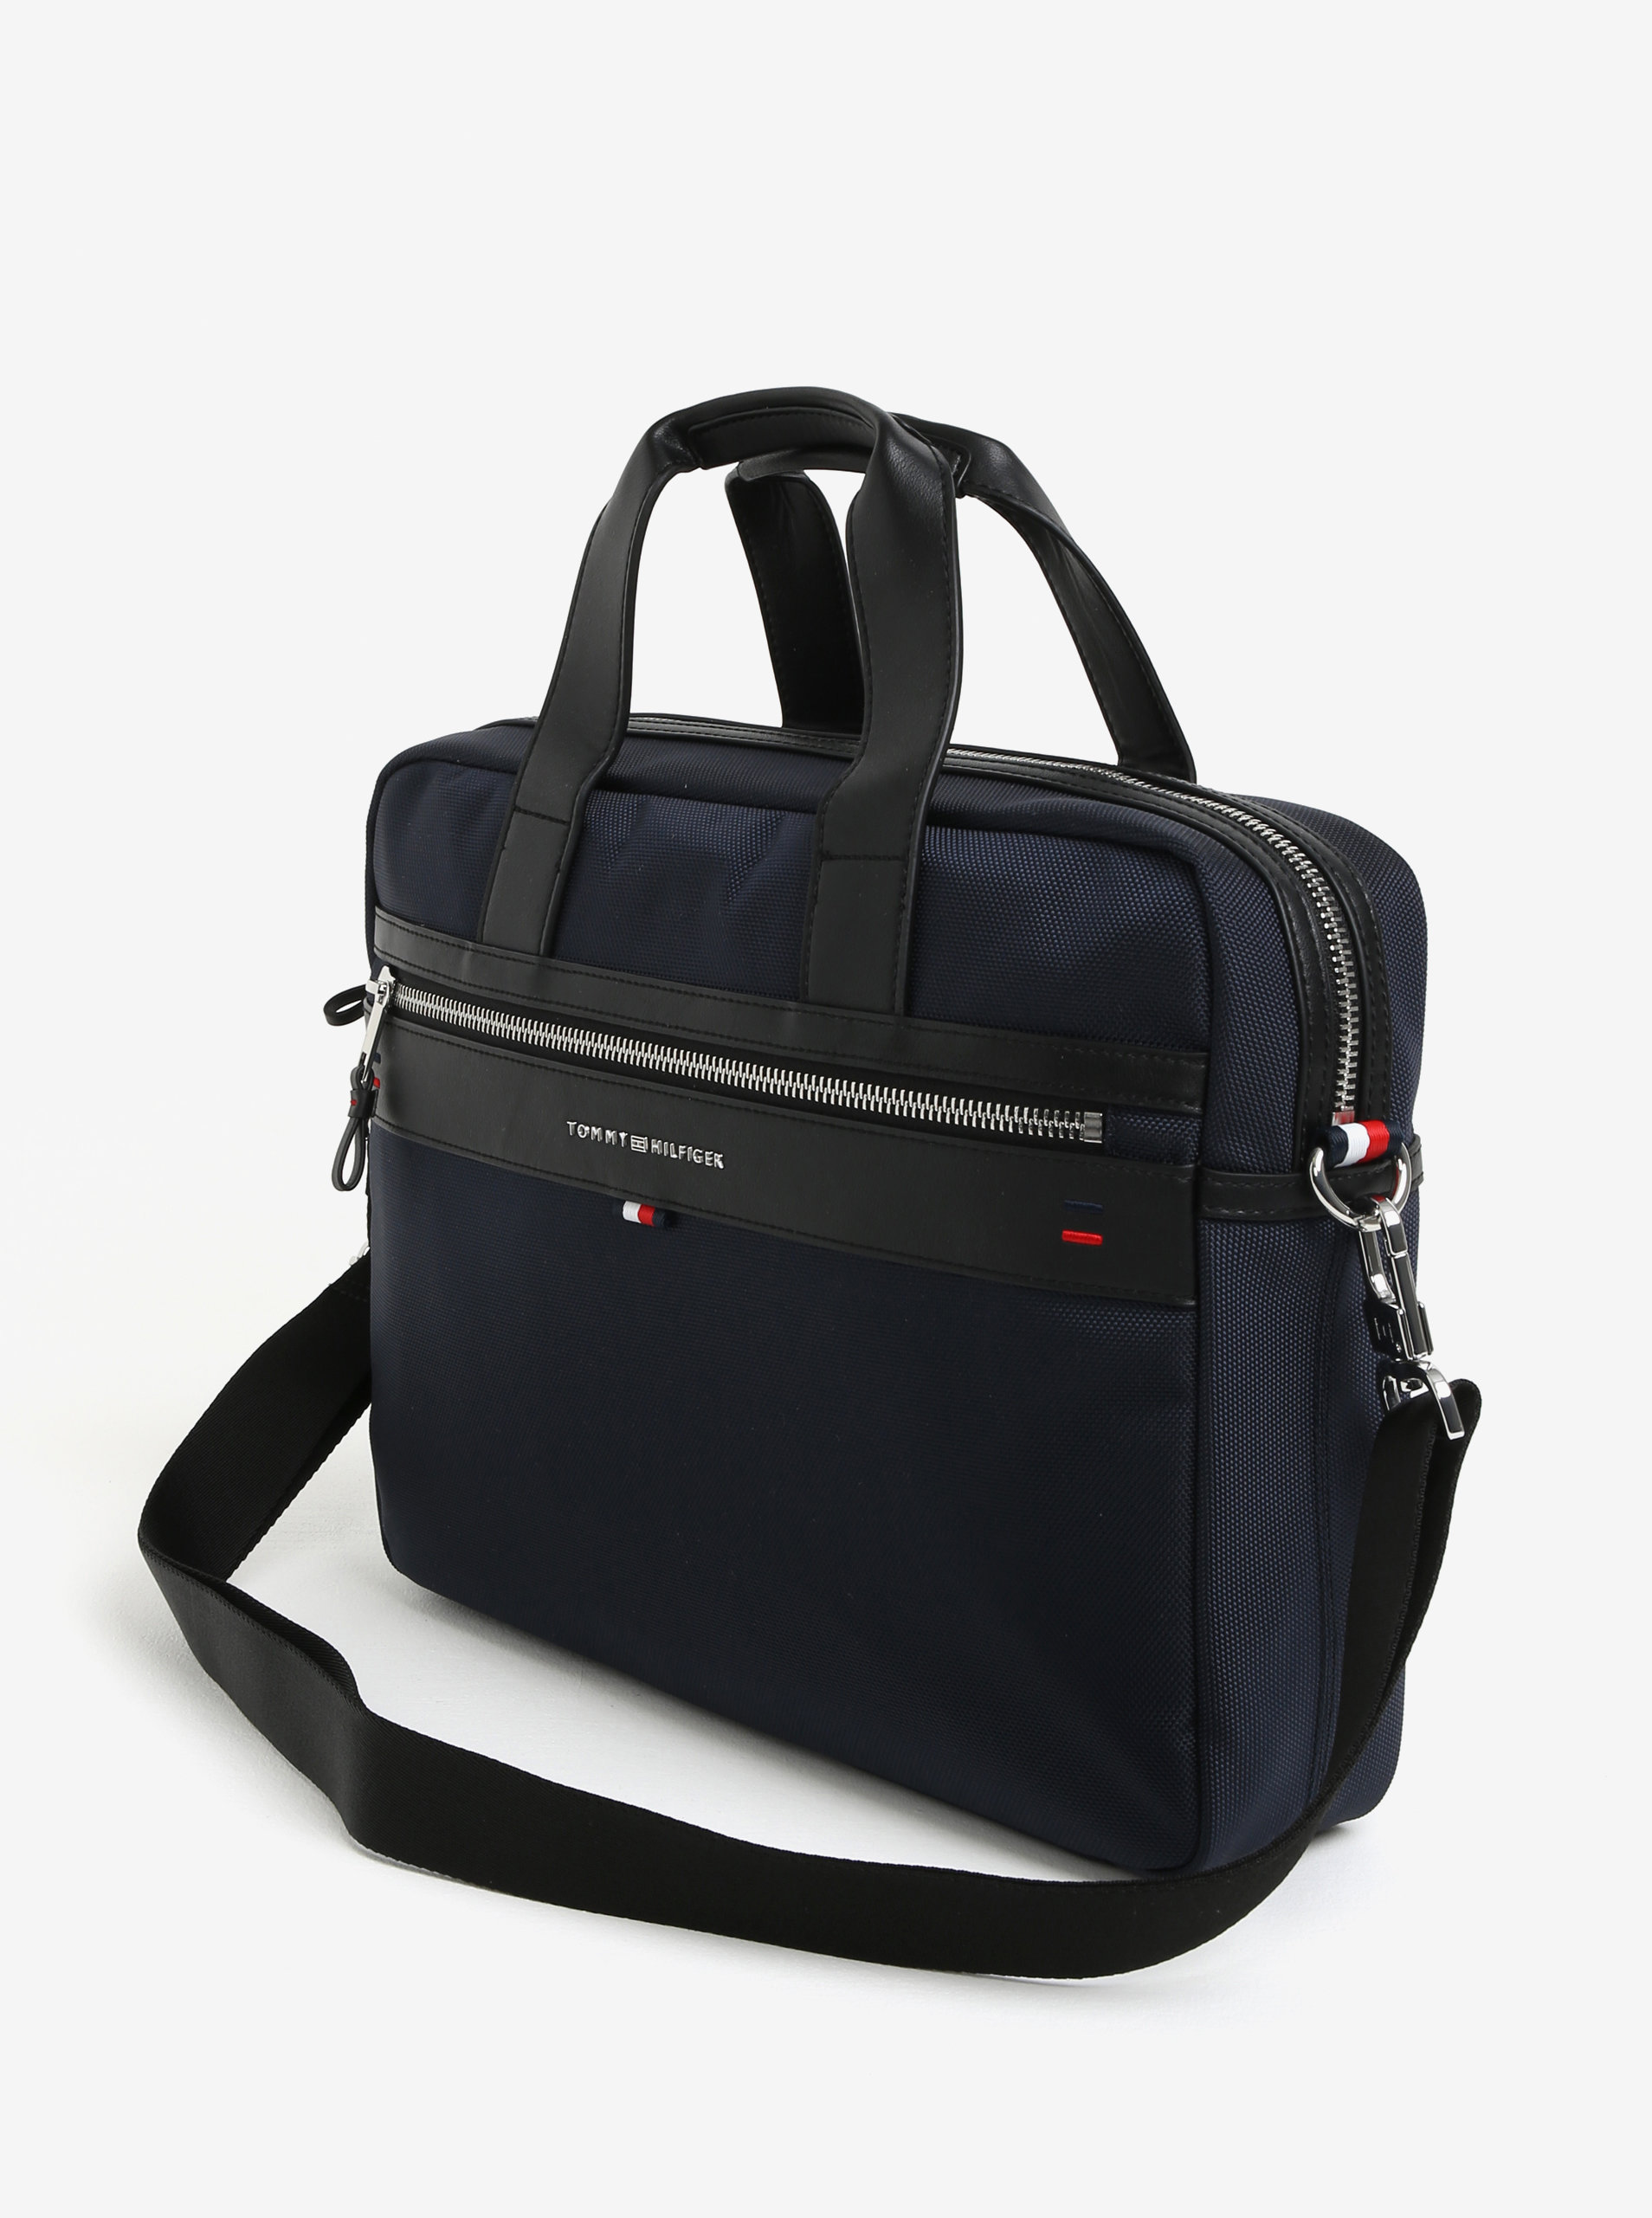 7f7837baa6 Tmavomodrá pánska taška na notebook Tommy Hilfiger Elevated ...